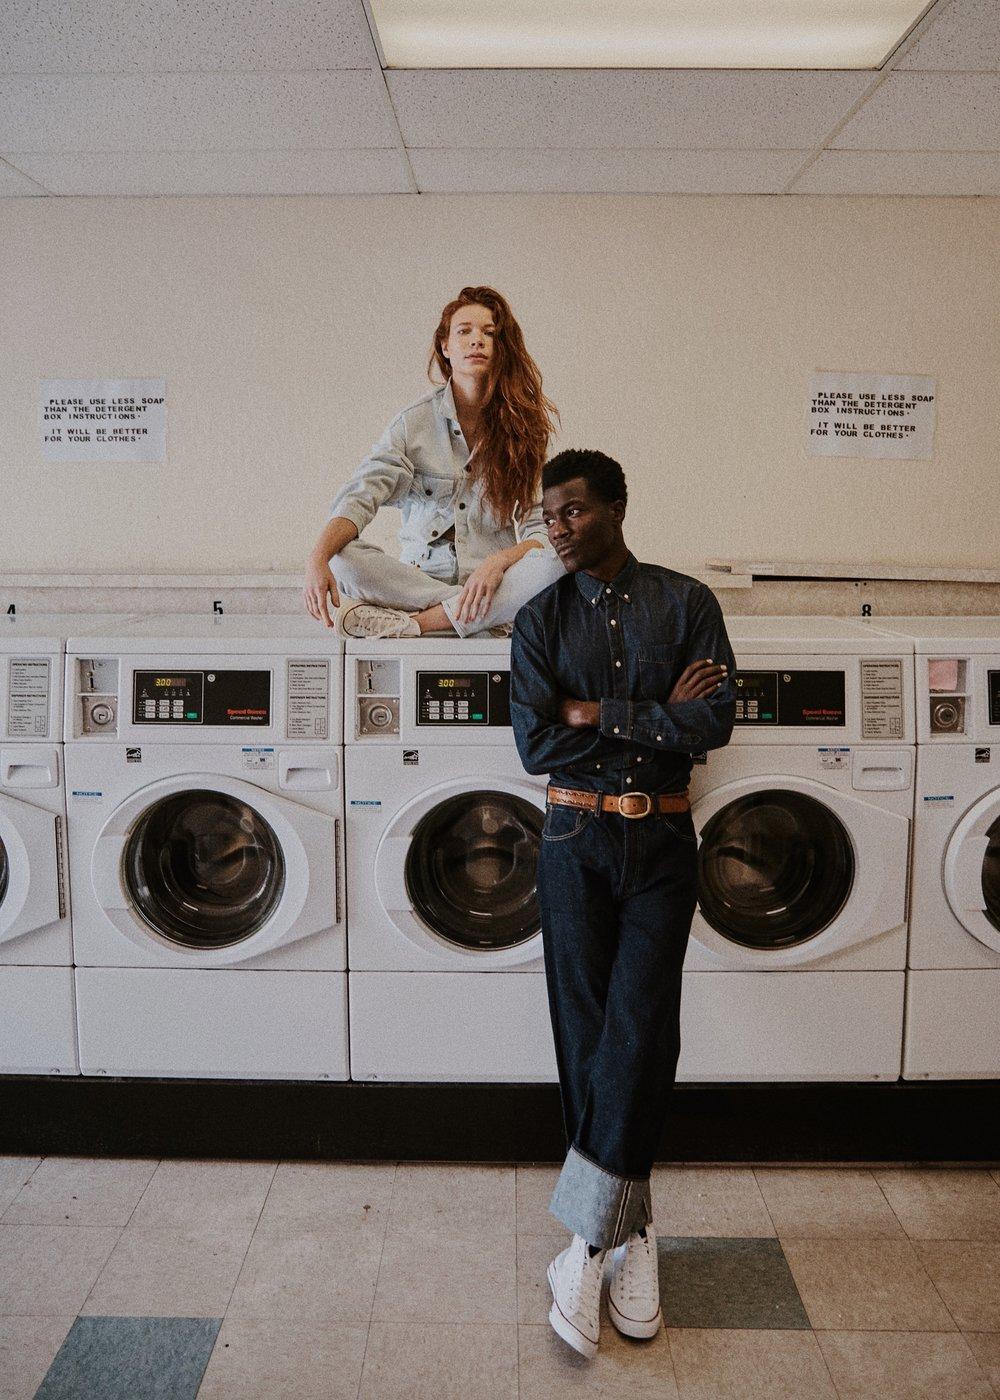 10_01_Laundromat-Arturo-Suzy-007_w.JPEG